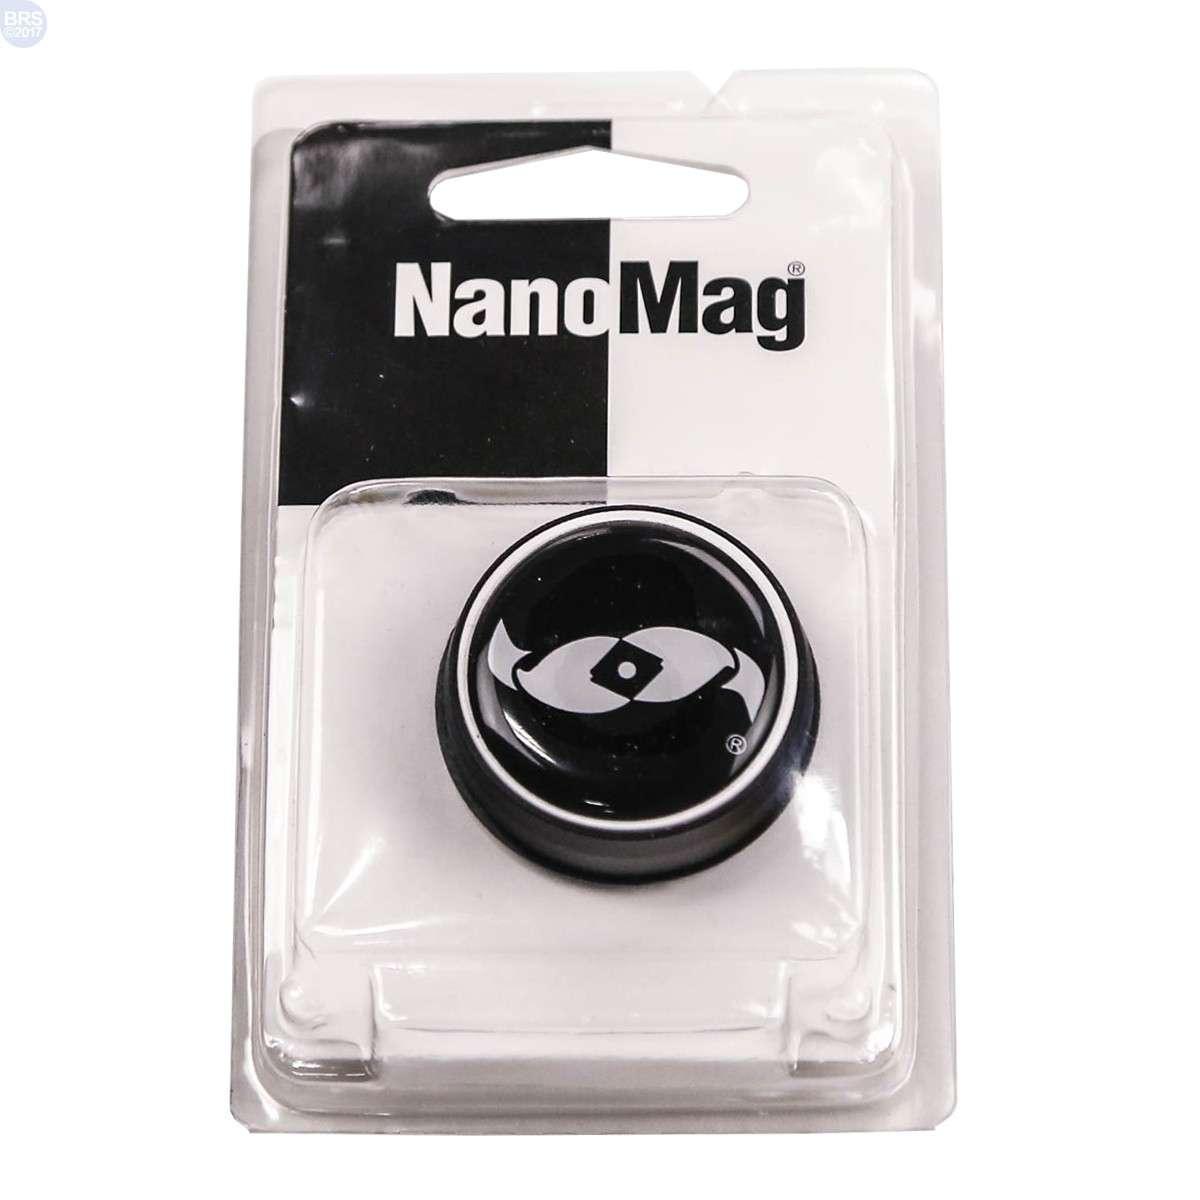 Nam Châm Lau Kinh Nano Mag